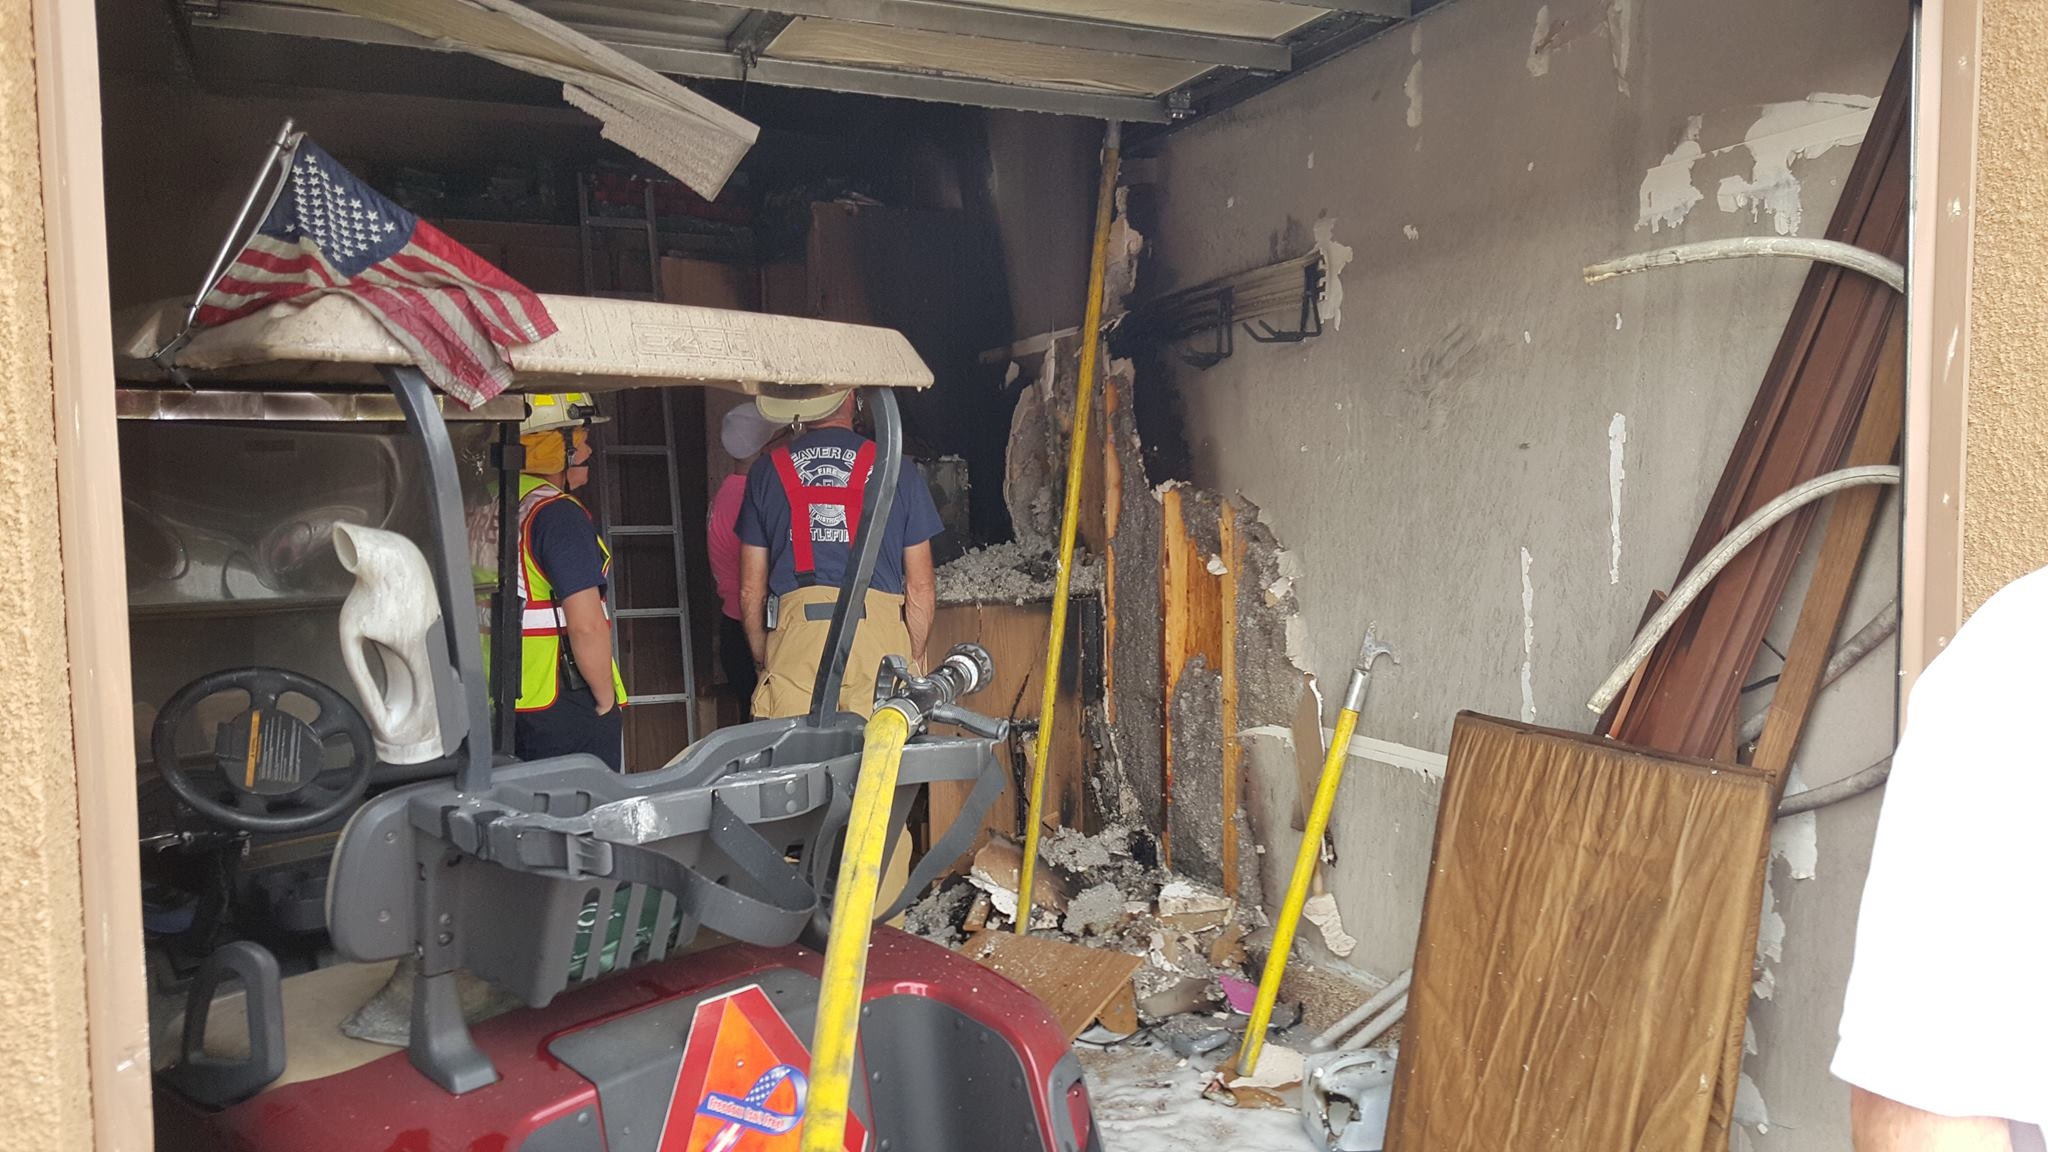 Fire Department responds to garage fire